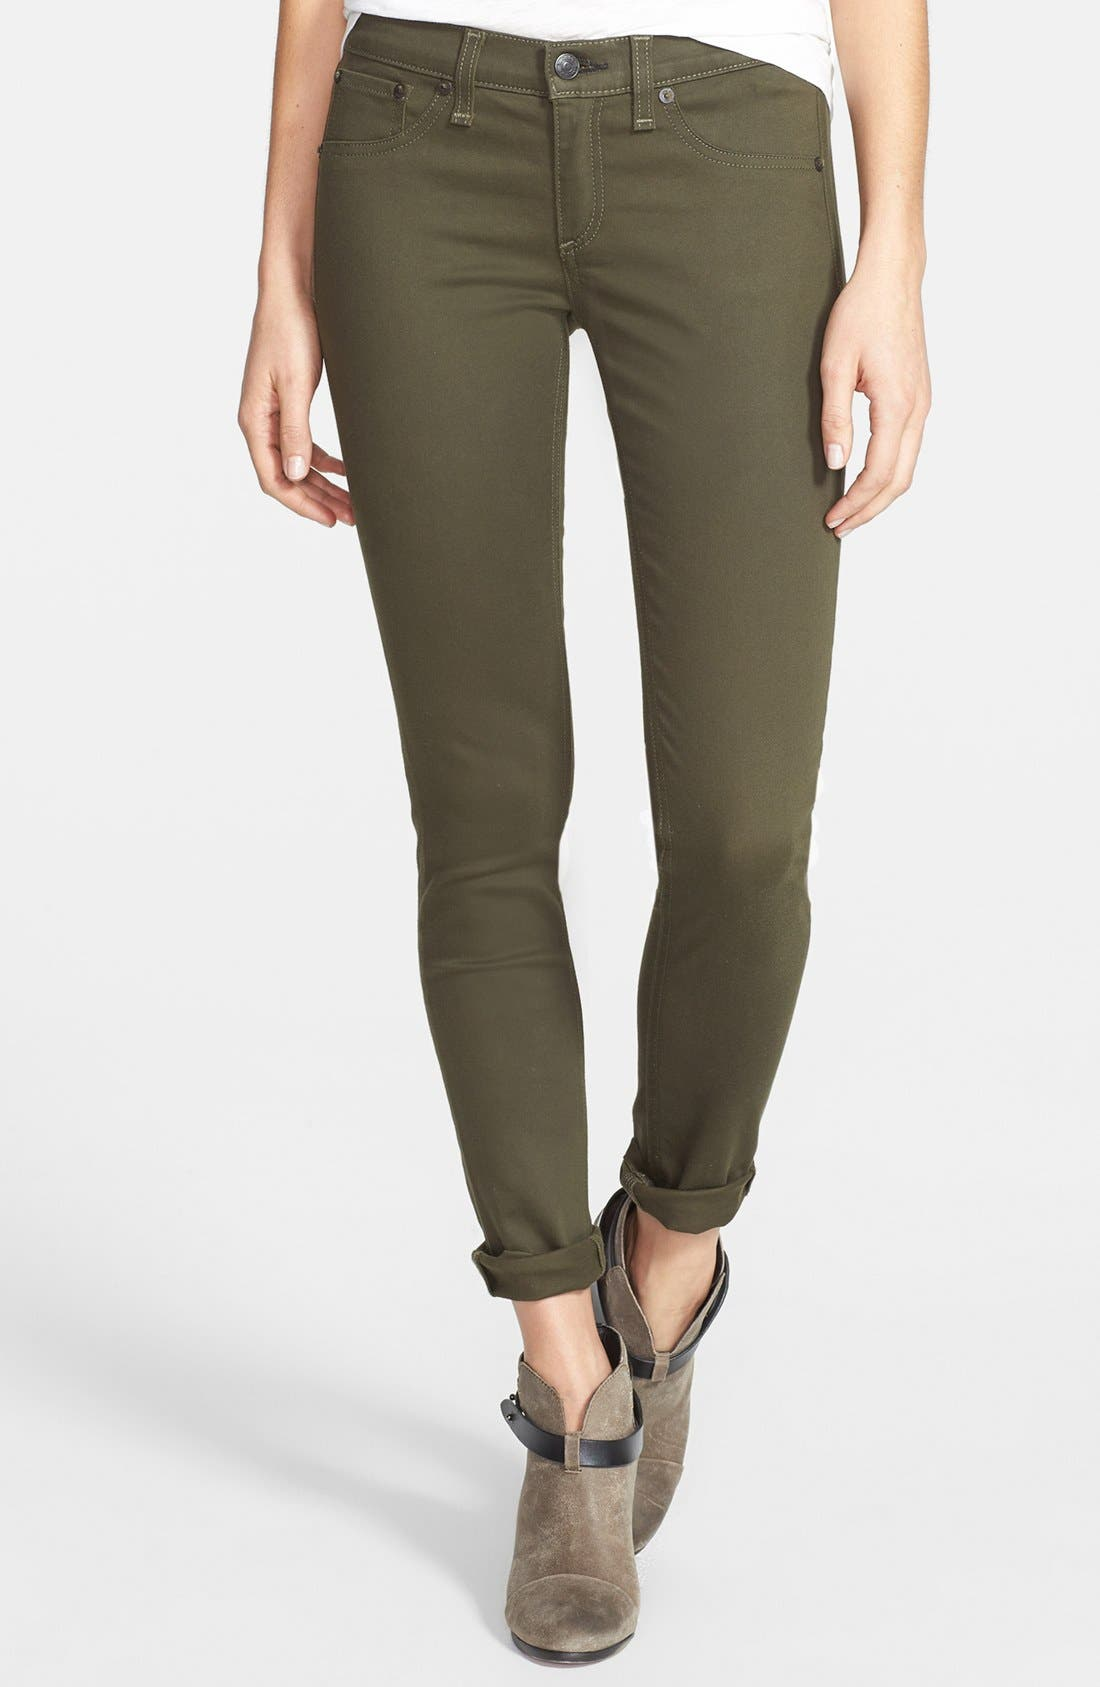 Alternate Image 1 Selected - rag & bone/JEAN 'The Legging' Sateen Skinny Jeans (Army Sateen)